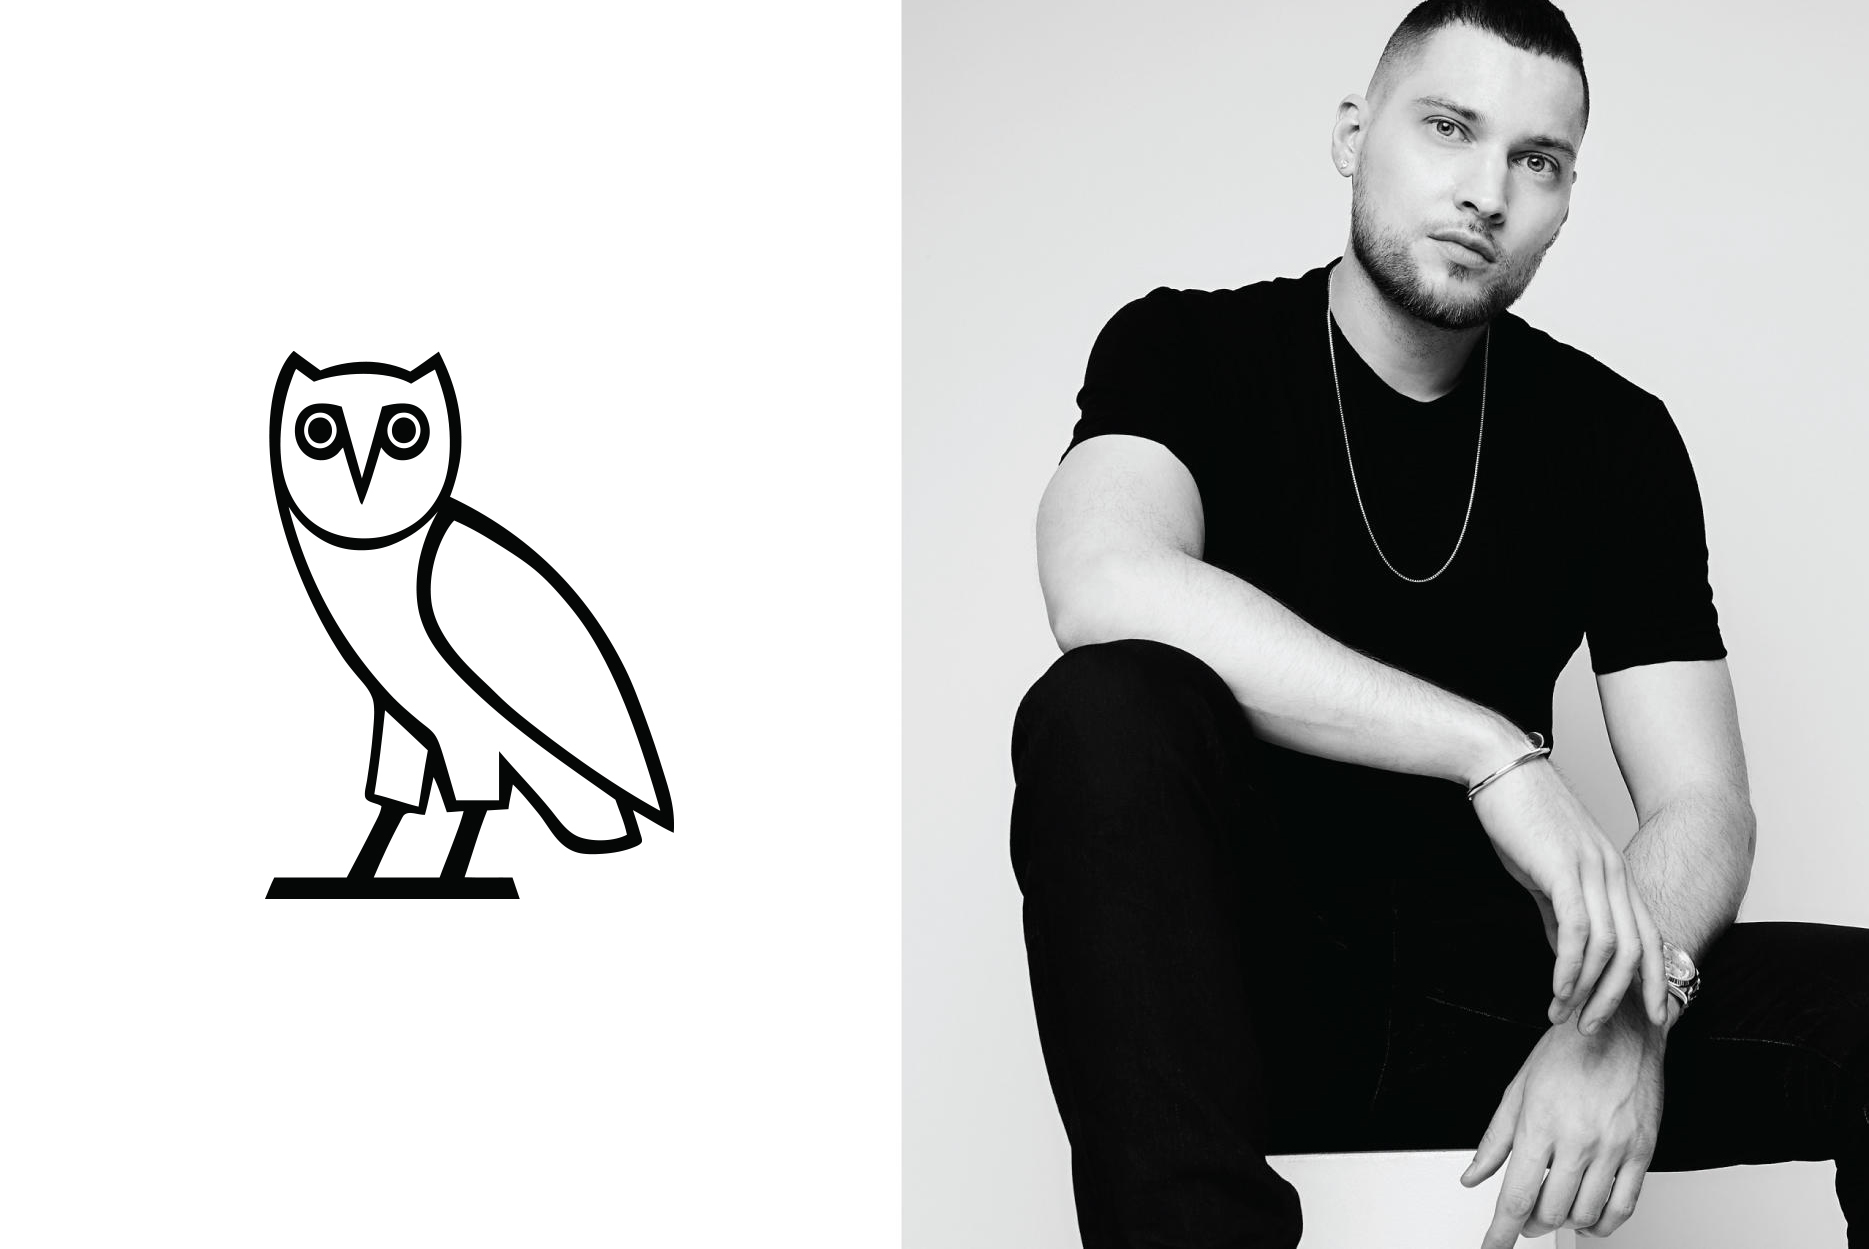 Contender-OVO-Toronto-Raptors-Oliver